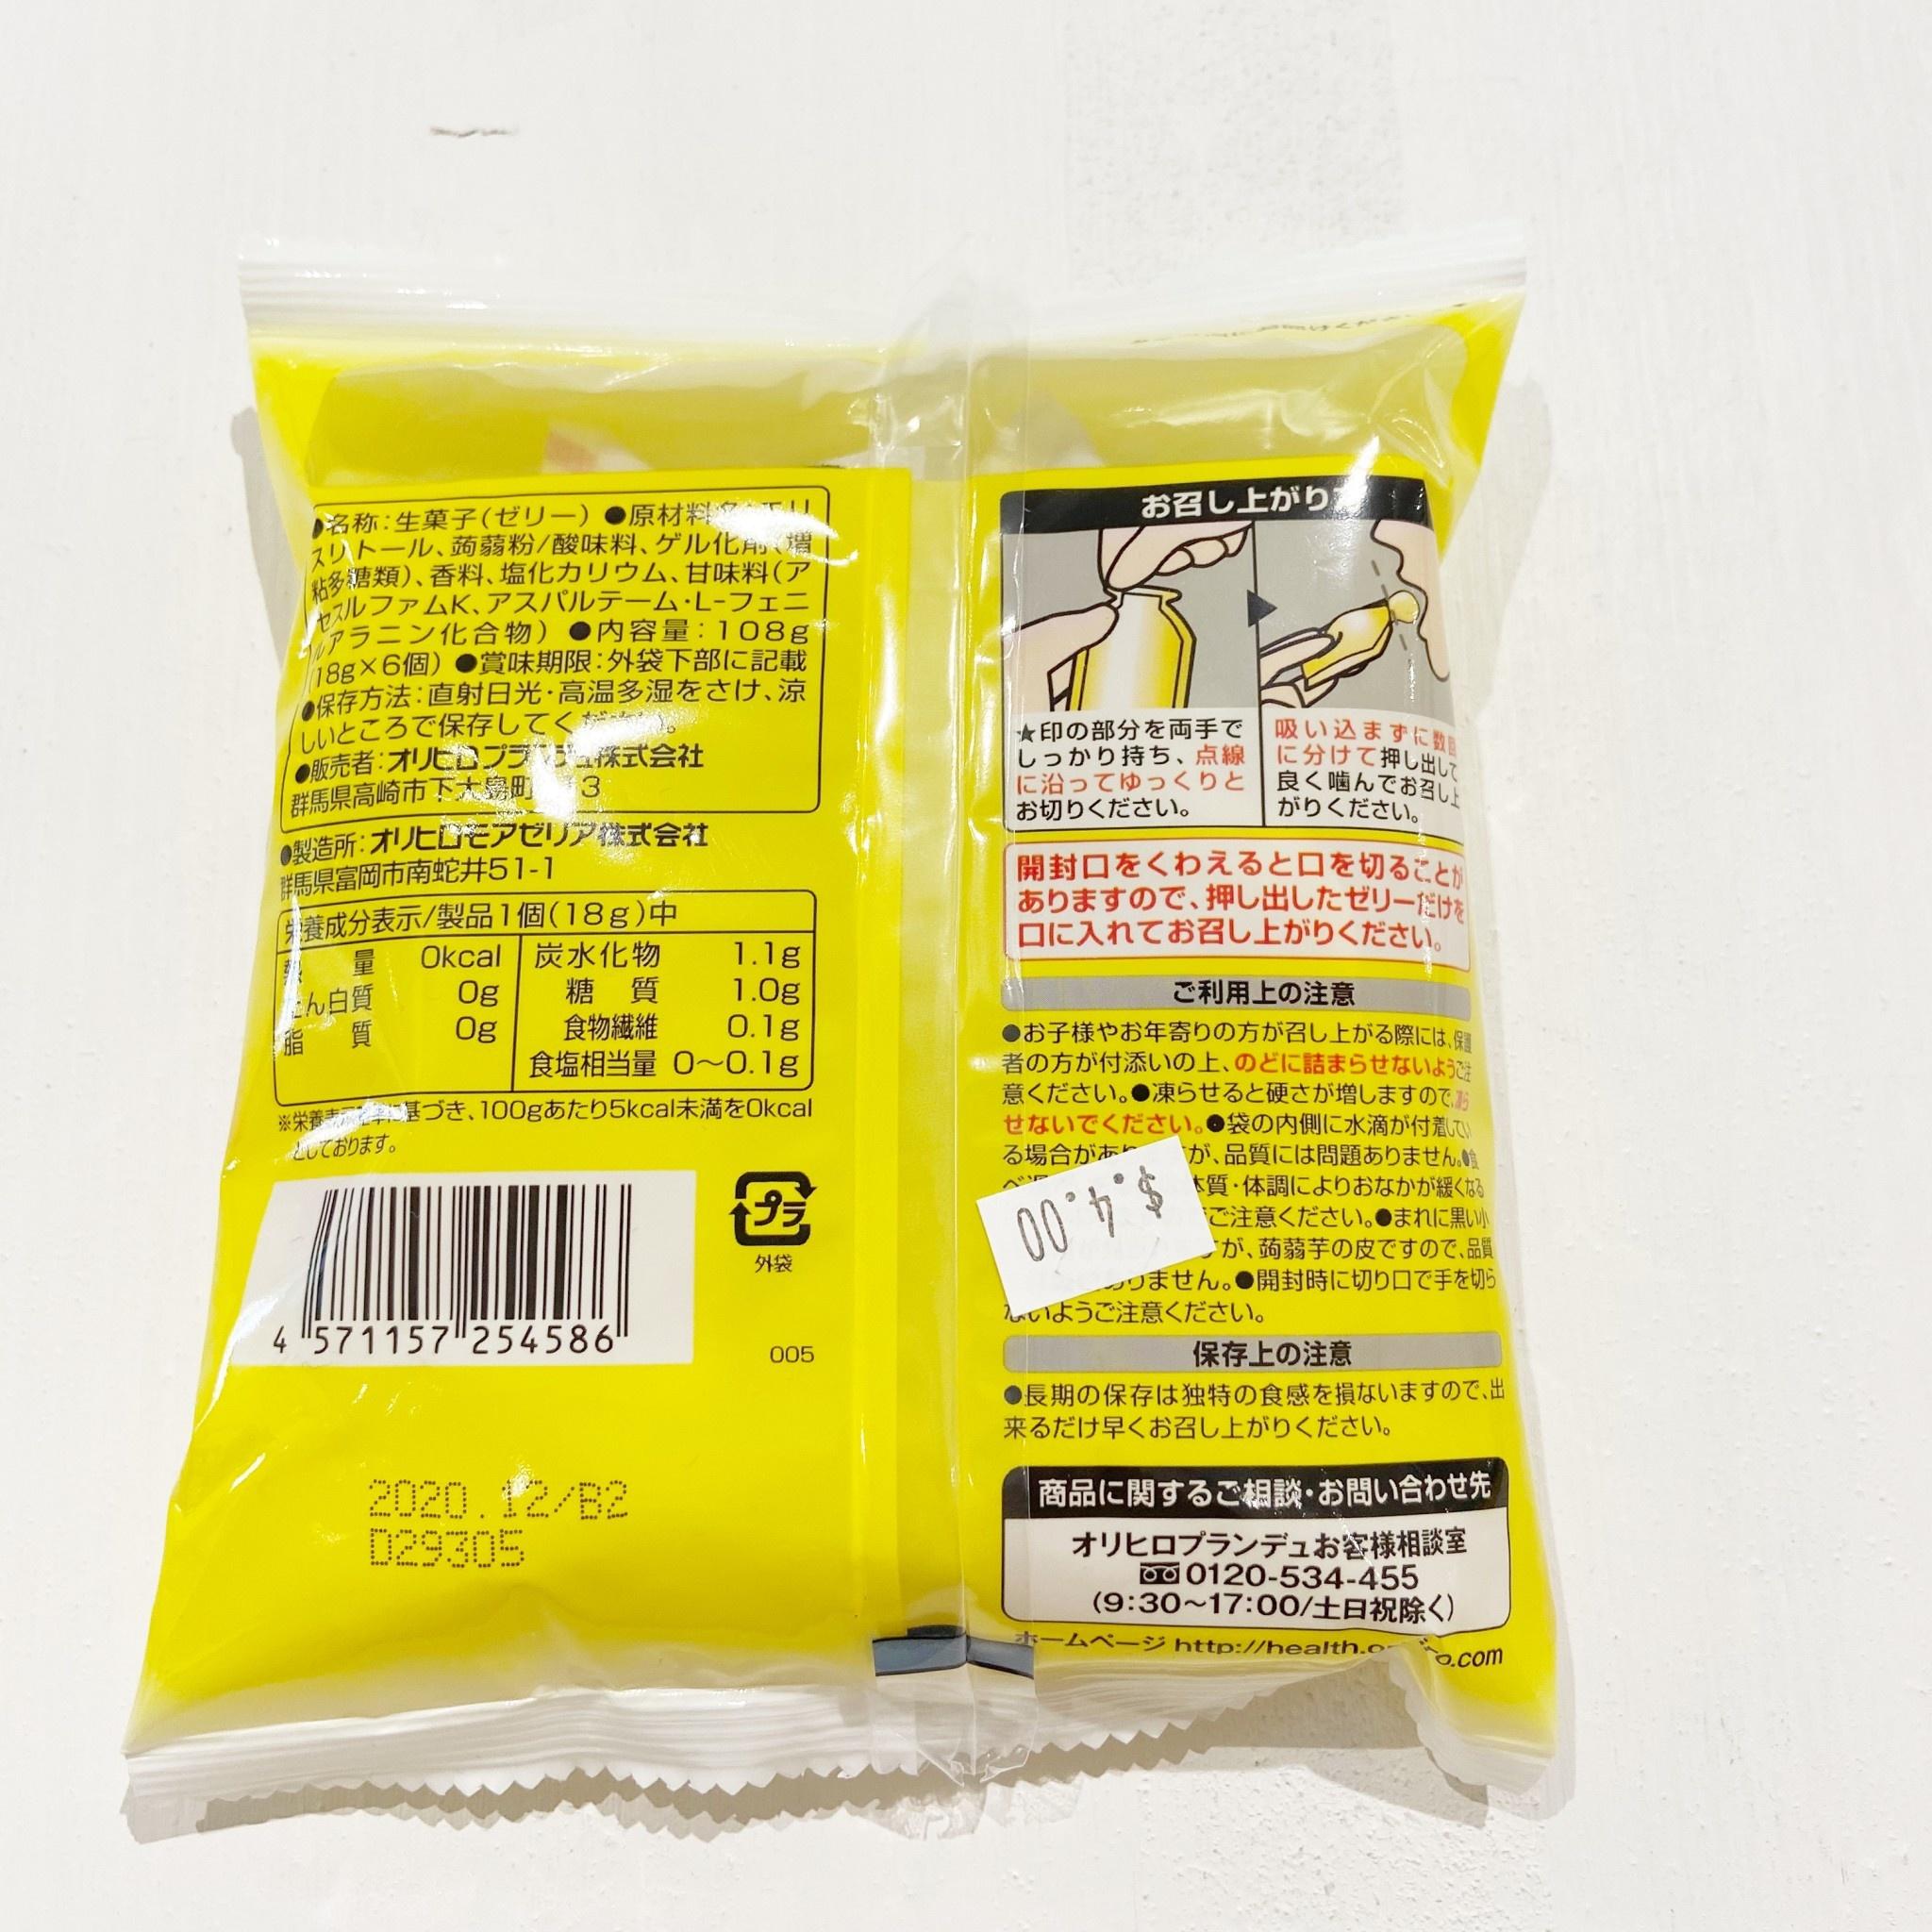 ORIHIRO Konjac Jelly 0 Cal Lemon Flavor